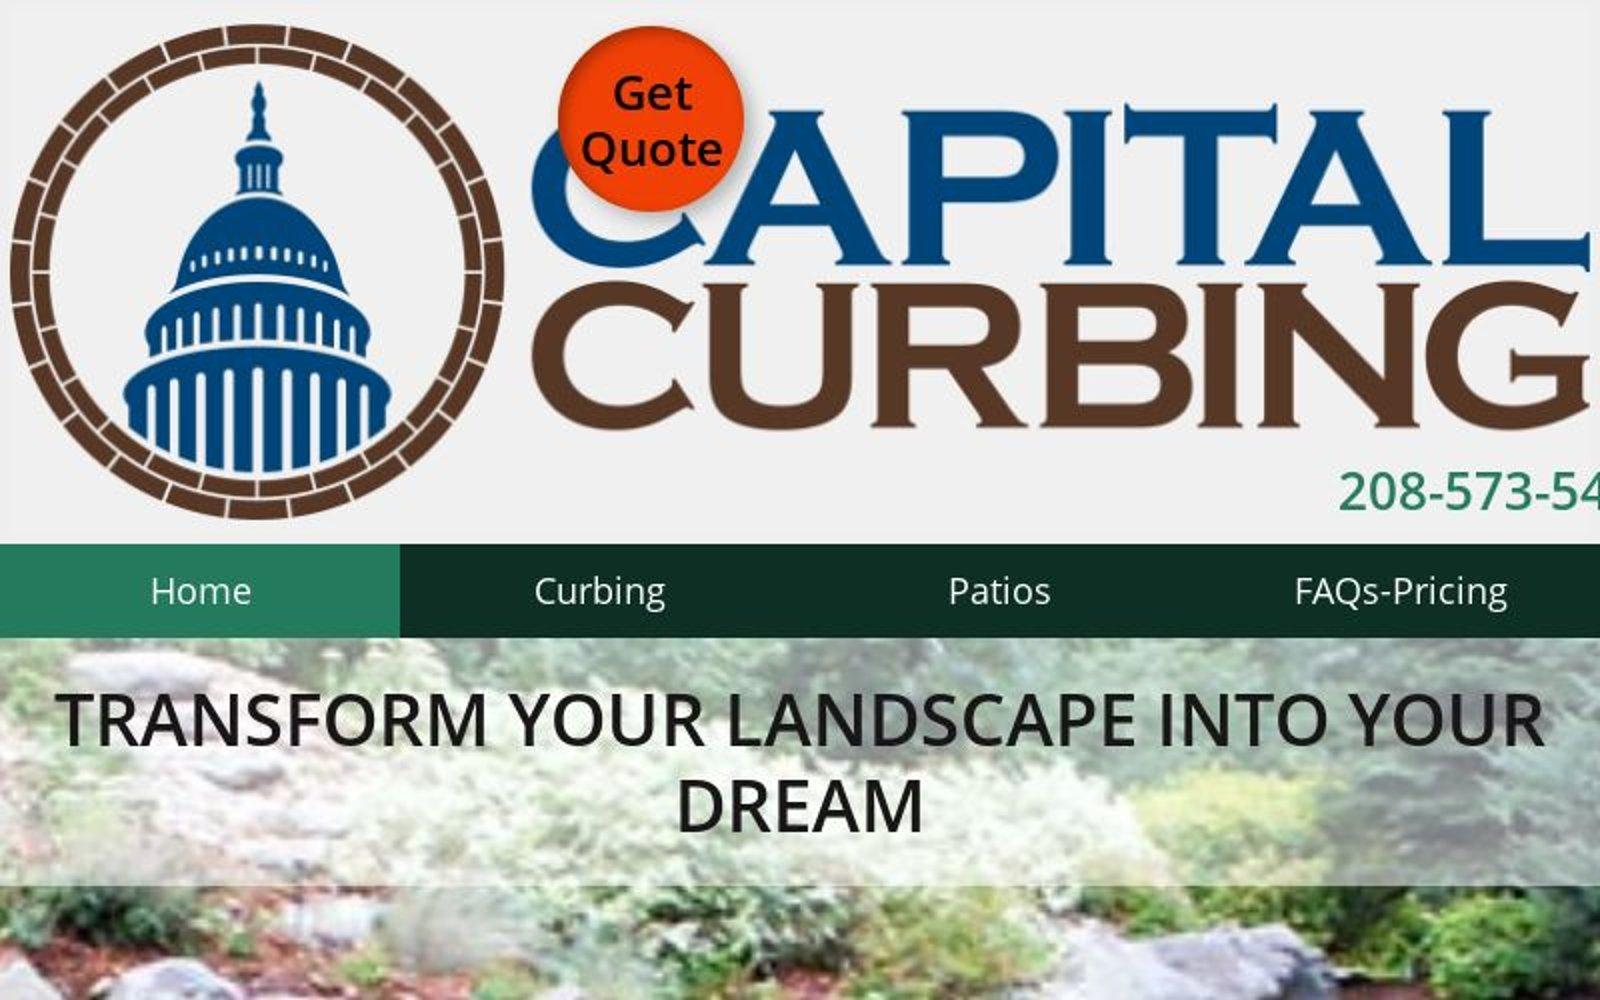 Capital Curbing Idaho 208 573 5466 Landscape Concrete Curbing